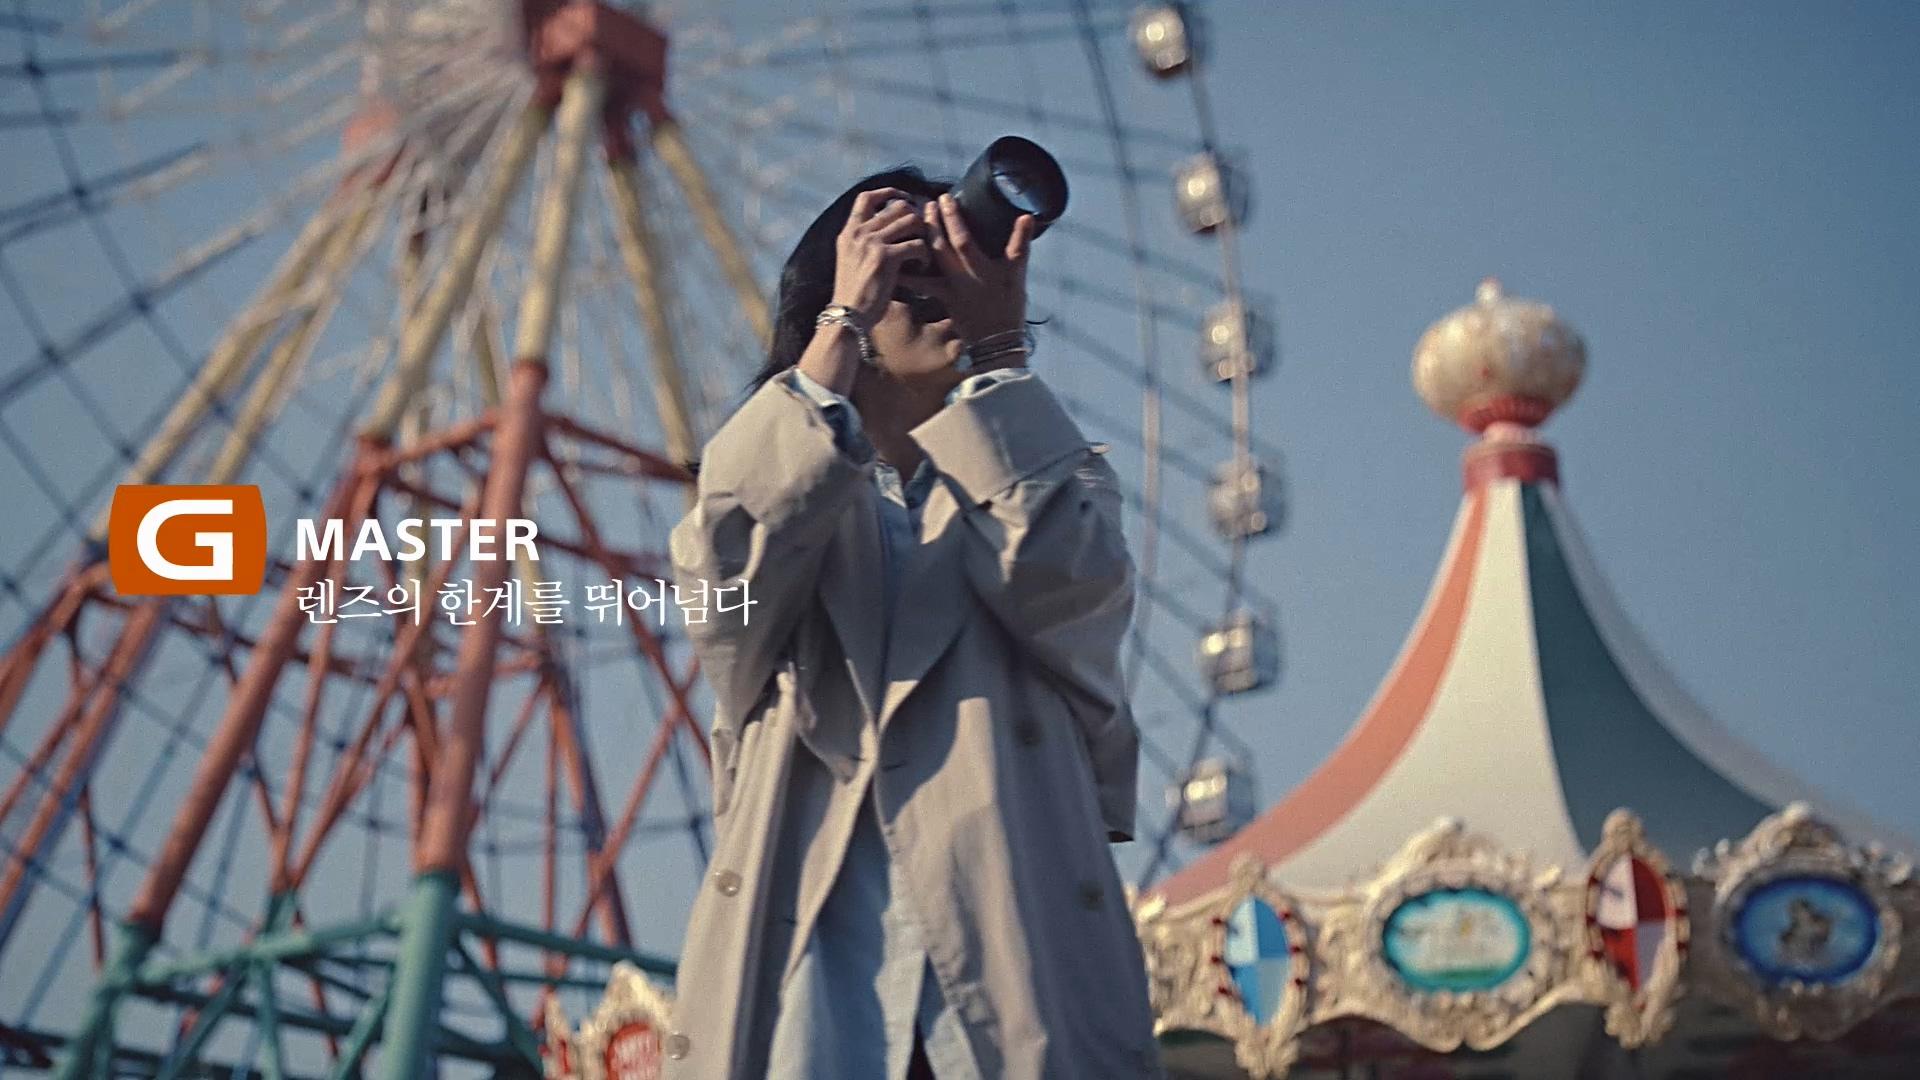 Sony GMaster 패션편 60s